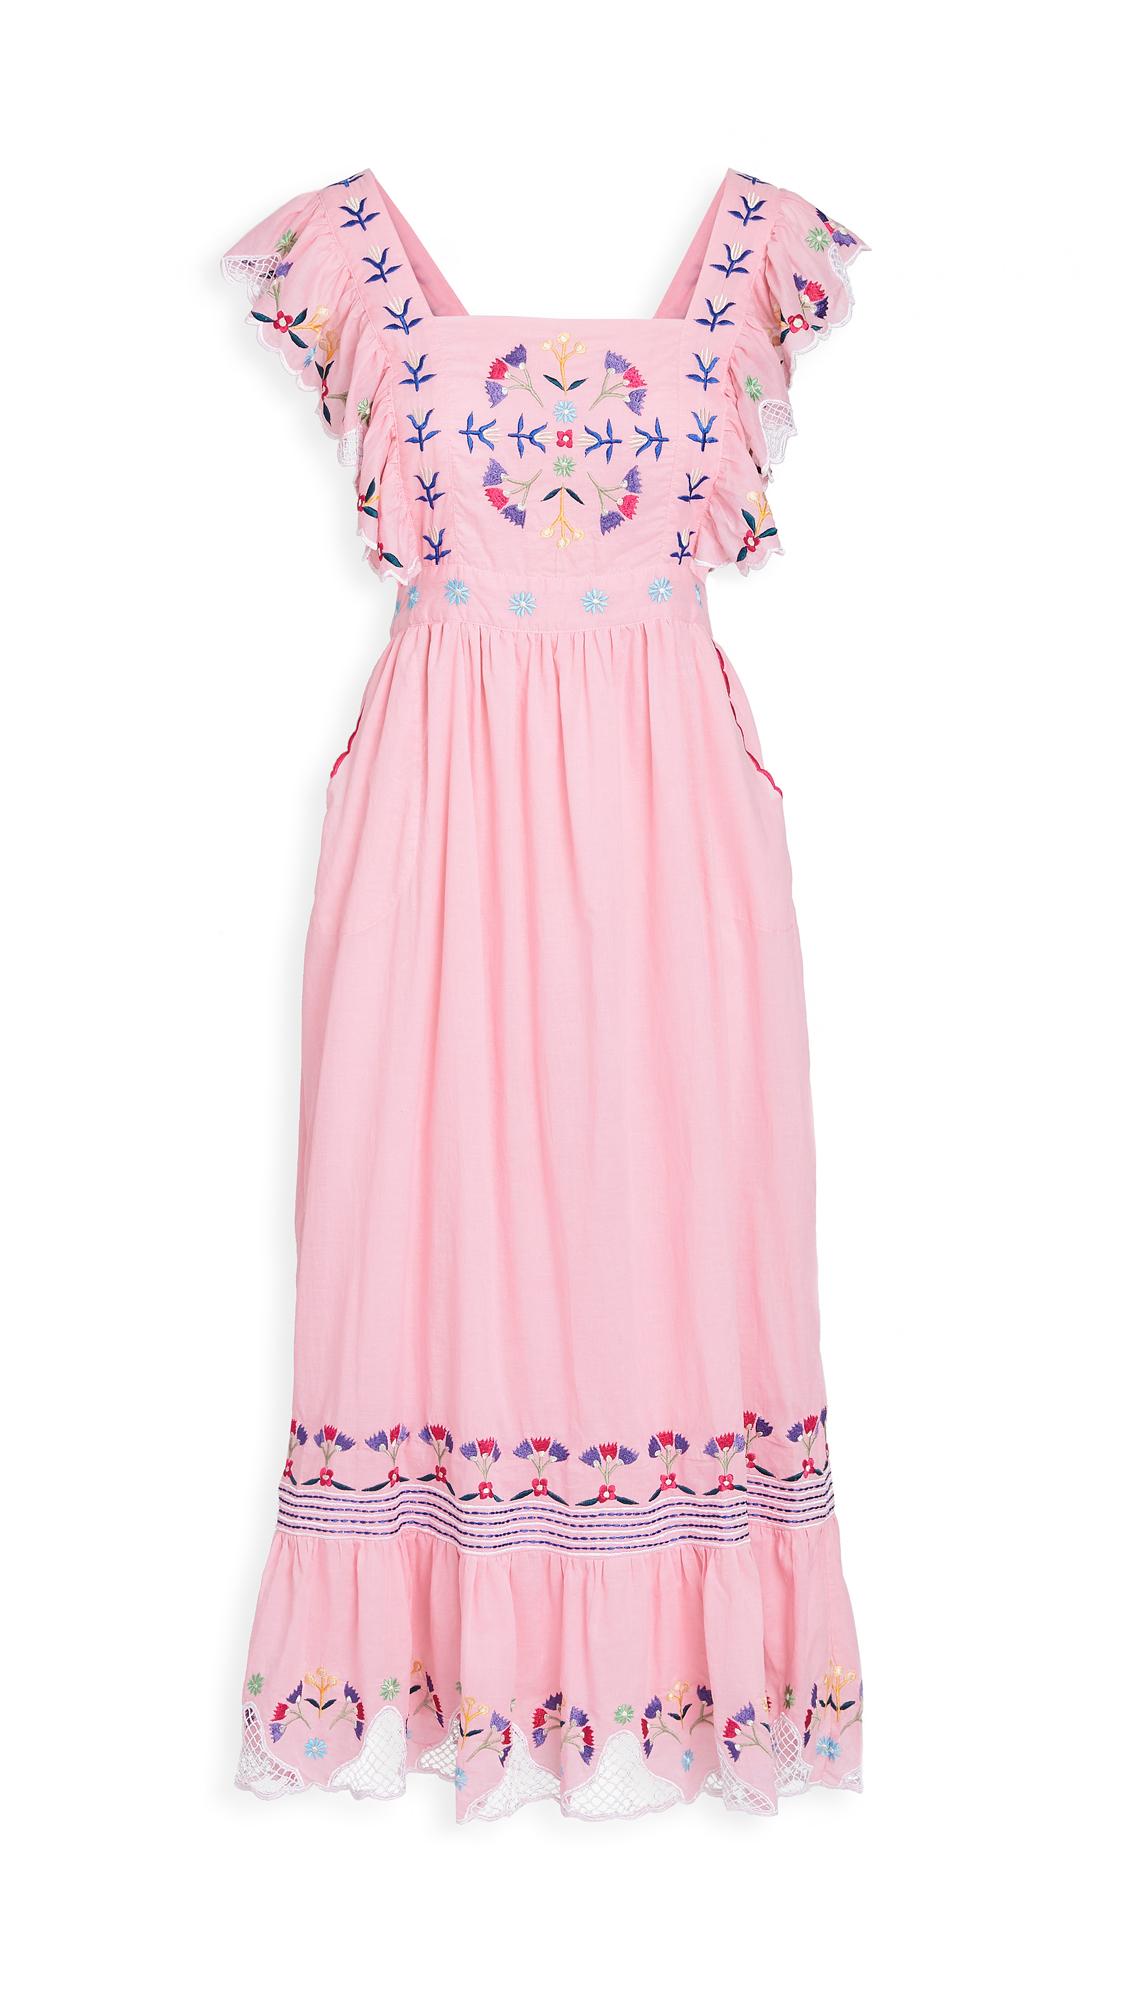 Photo of CeliaB Wild Rose Dress - shop CeliaB Clothing, Dresses online